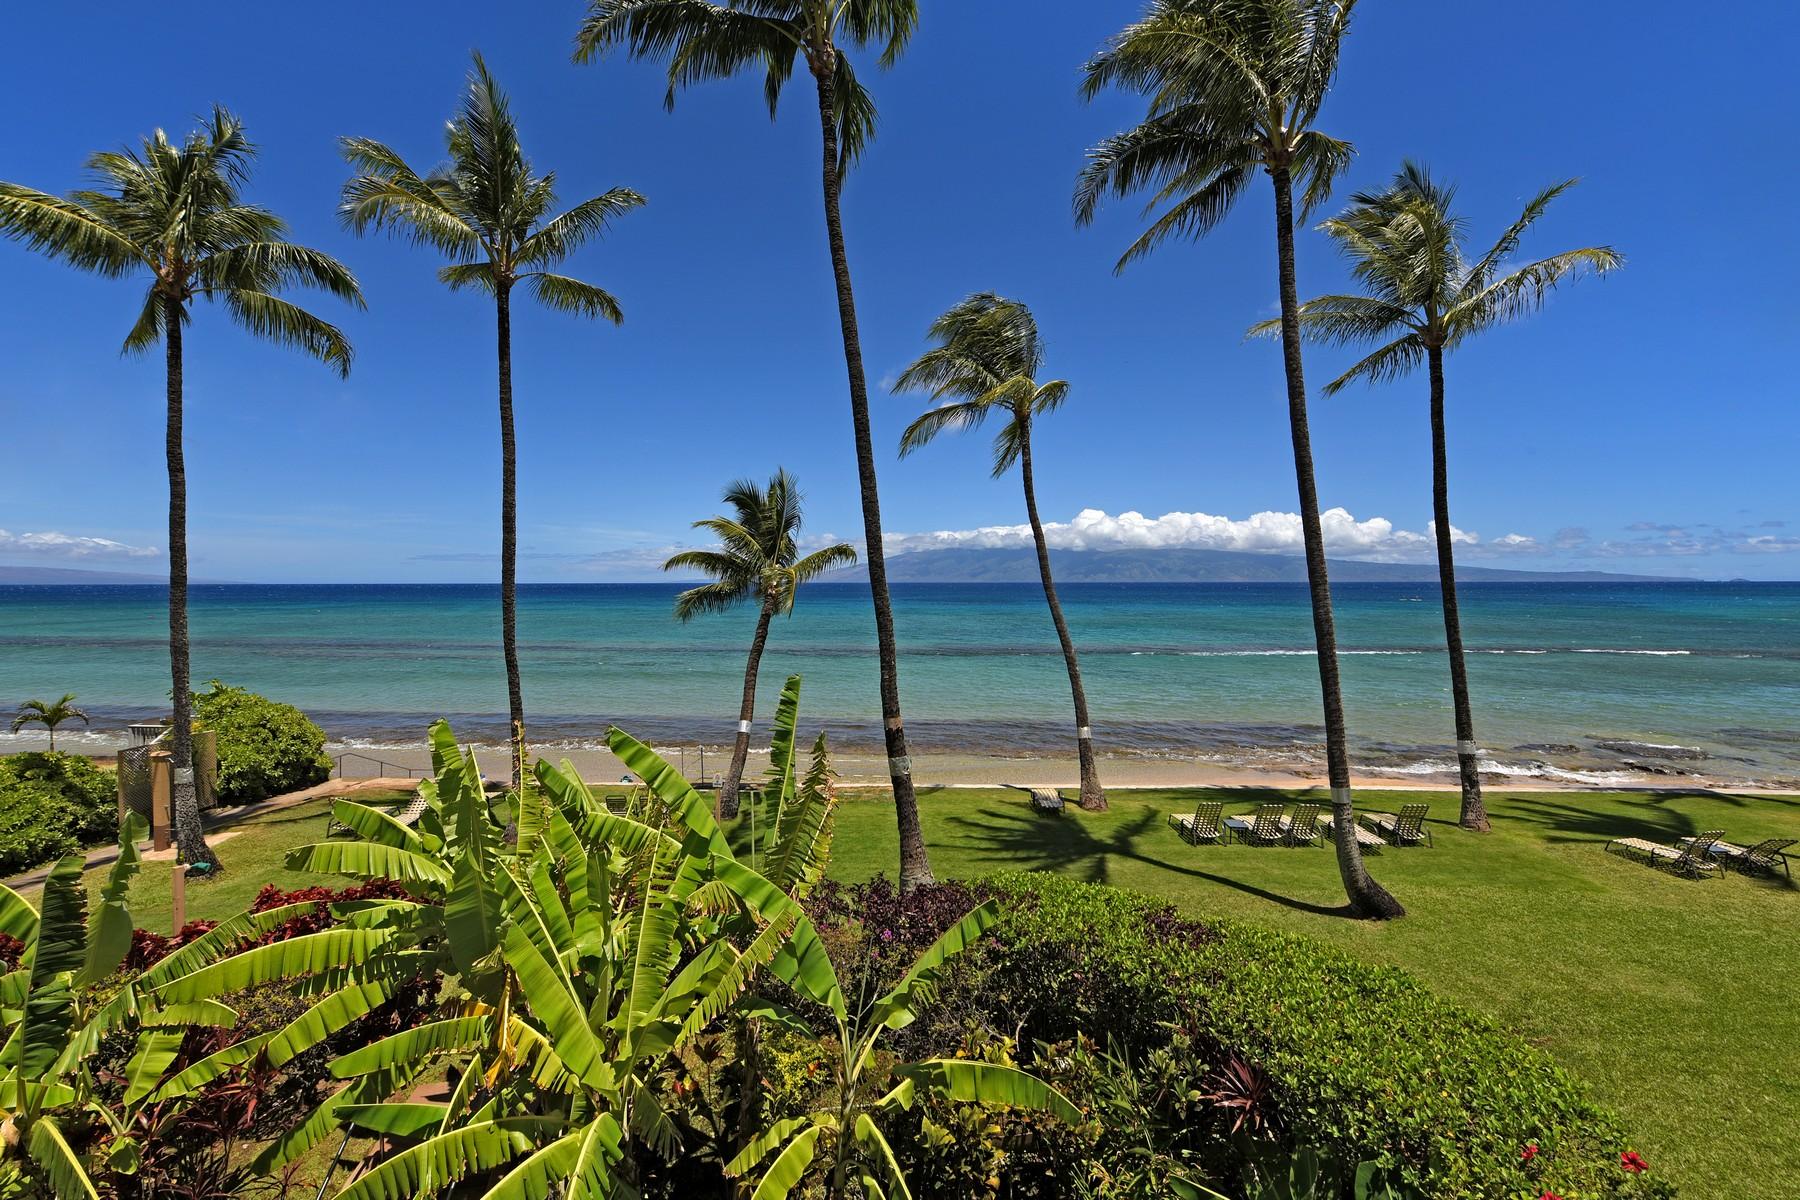 Nhà chung cư vì Bán tại Remodeled Oceanfront Condominium in Honokowai 3601 Lower Honoapiilani Road, Paki Maui 208, Honokowai, Hawaii, 96761 Hoa Kỳ